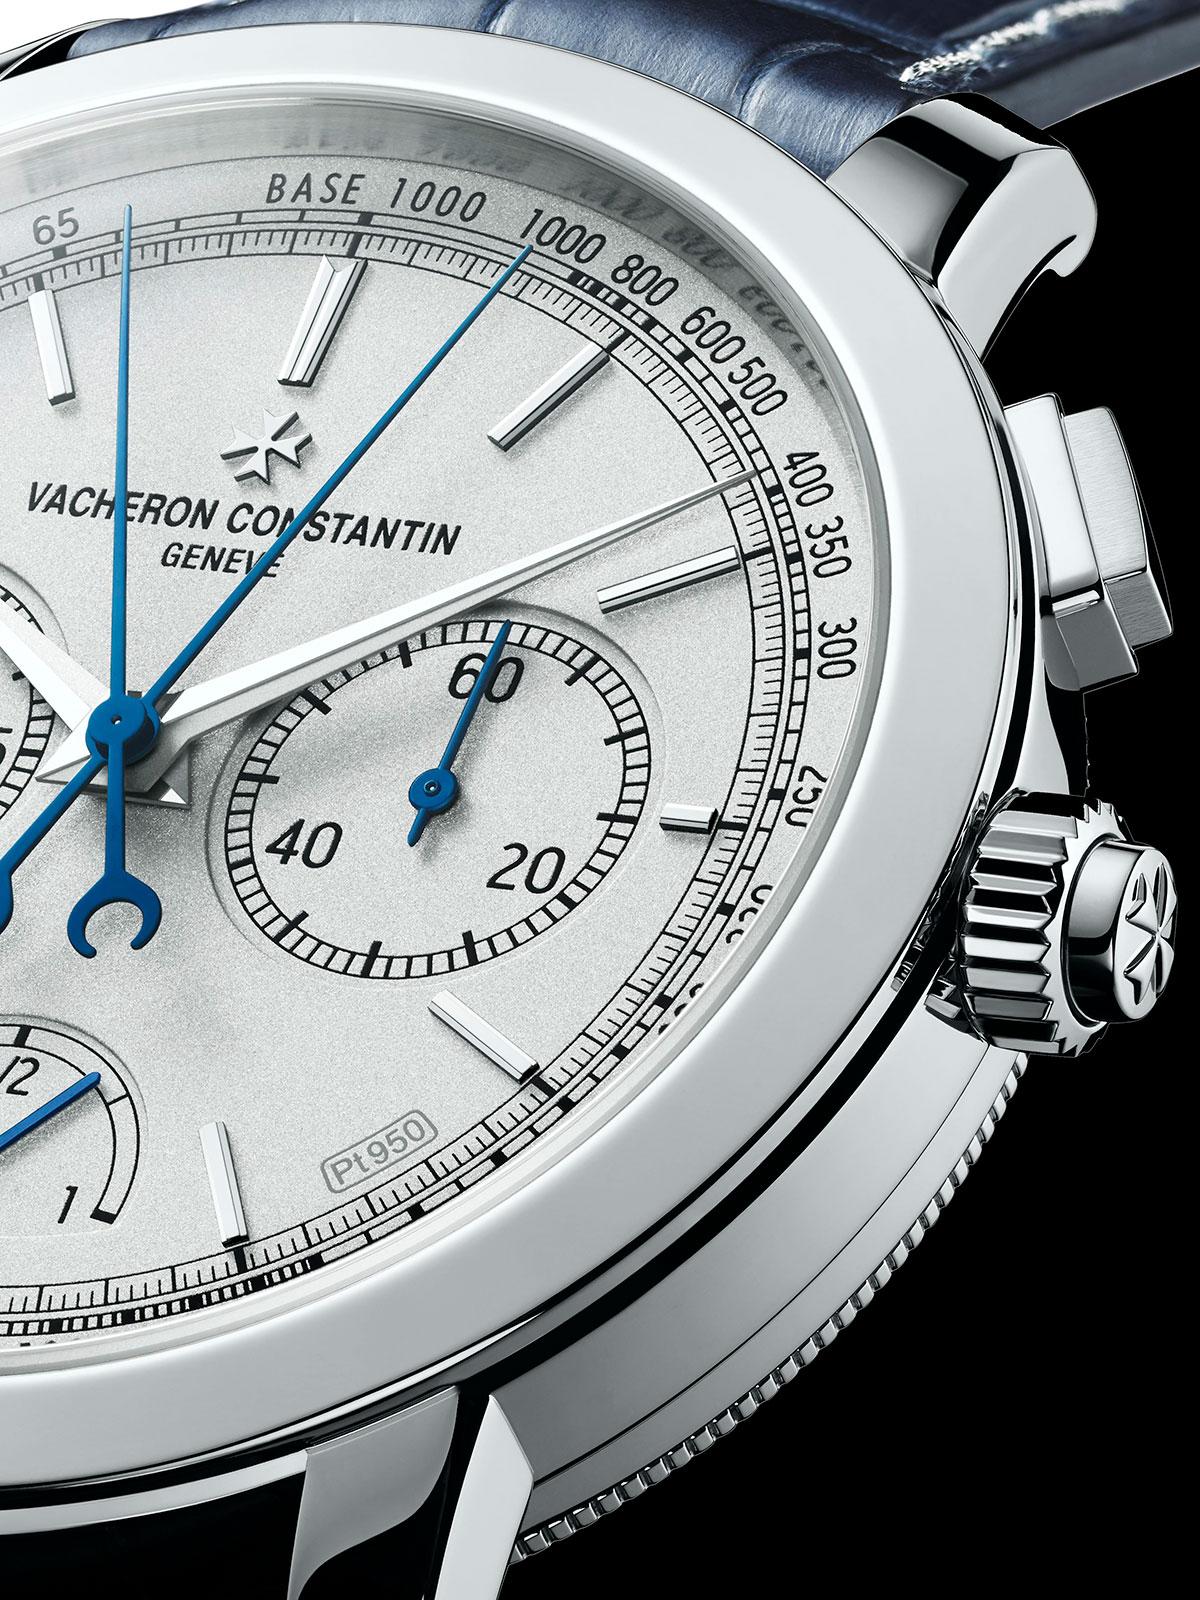 Lateral del Vacheron Constantin Traditionnelle Split-Seconds Chronograph Ultra-thin